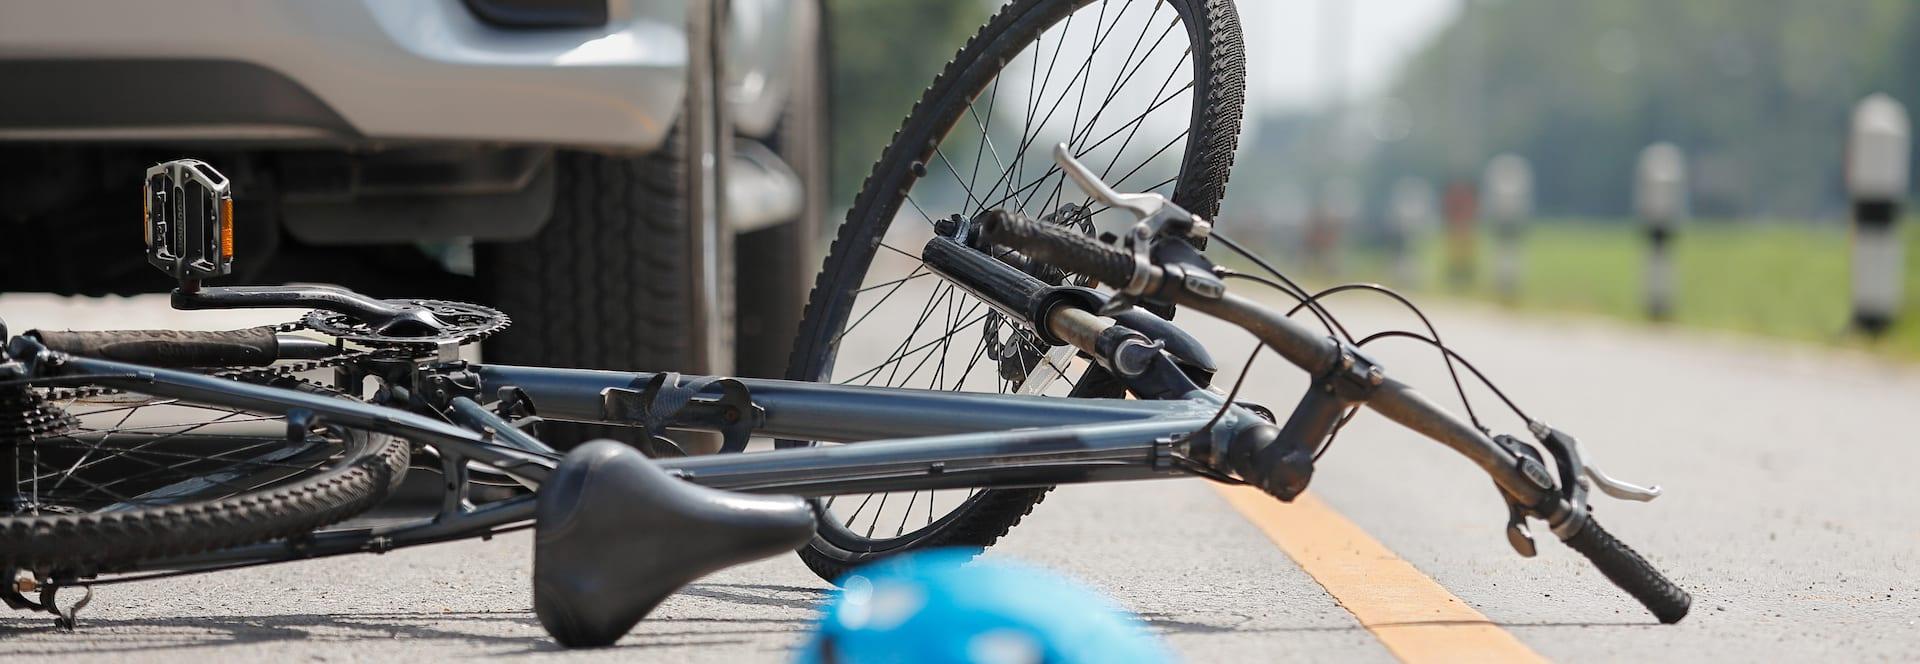 Bicycle Accident Lawyer Atlanta